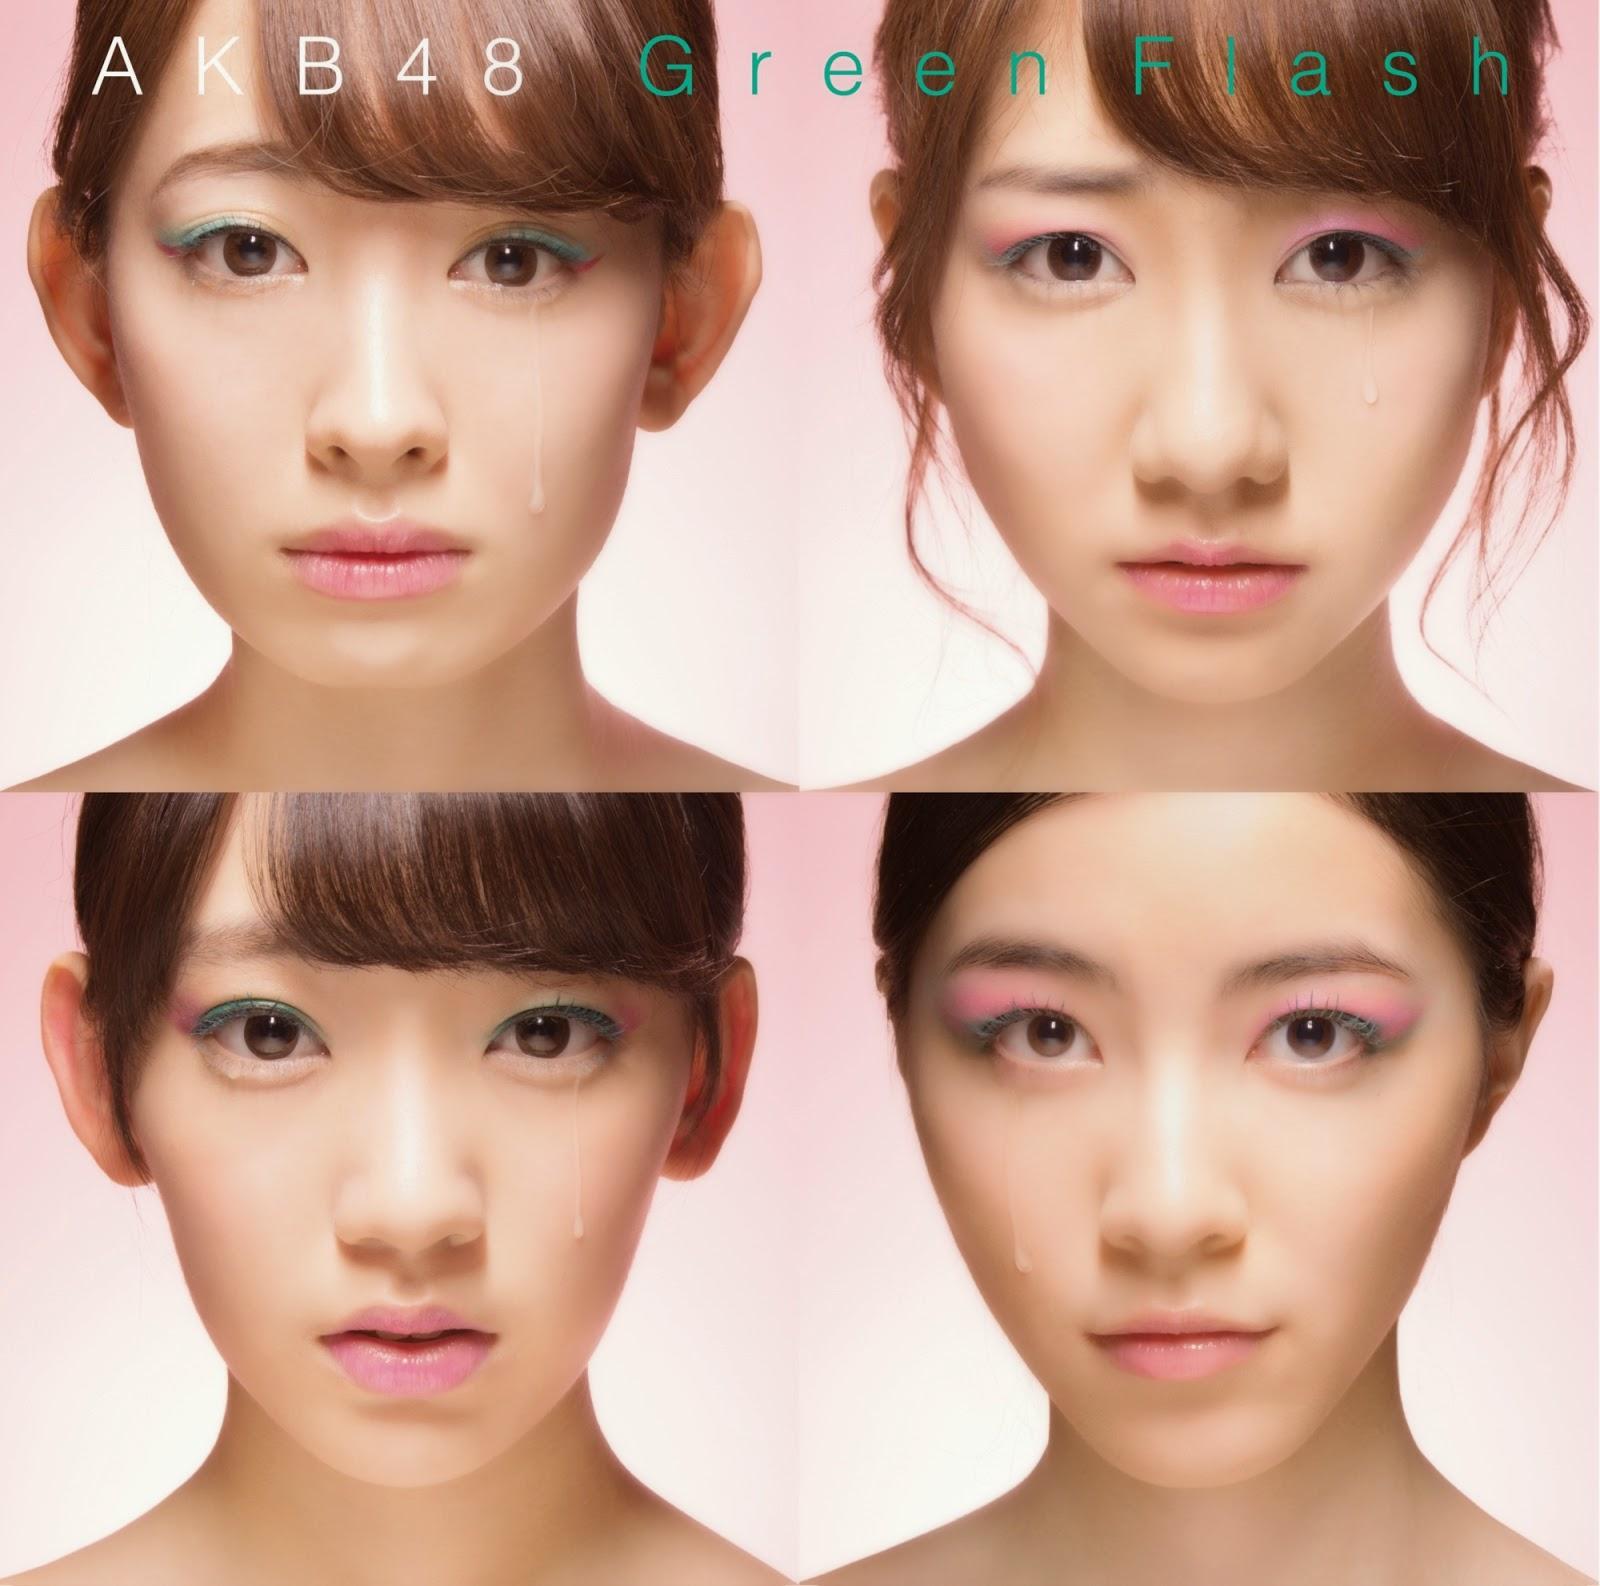 AKB48 春の光 近づいた夏 歌詞 Haru no Hikari Chikazuita Natsu lyrics